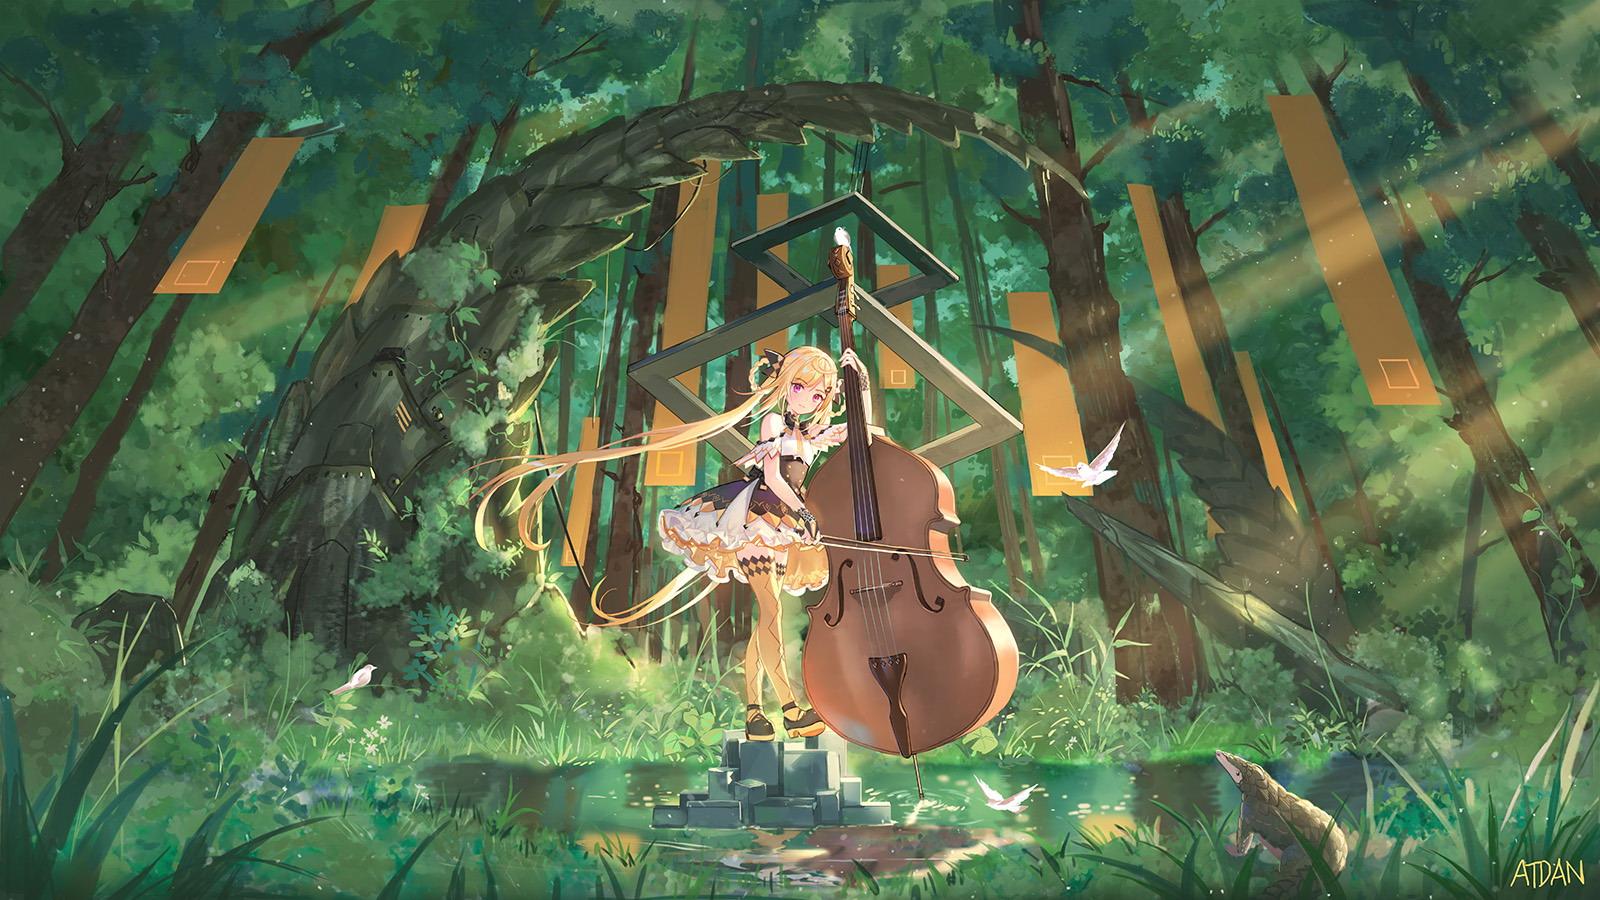 Forest - ATDAN-